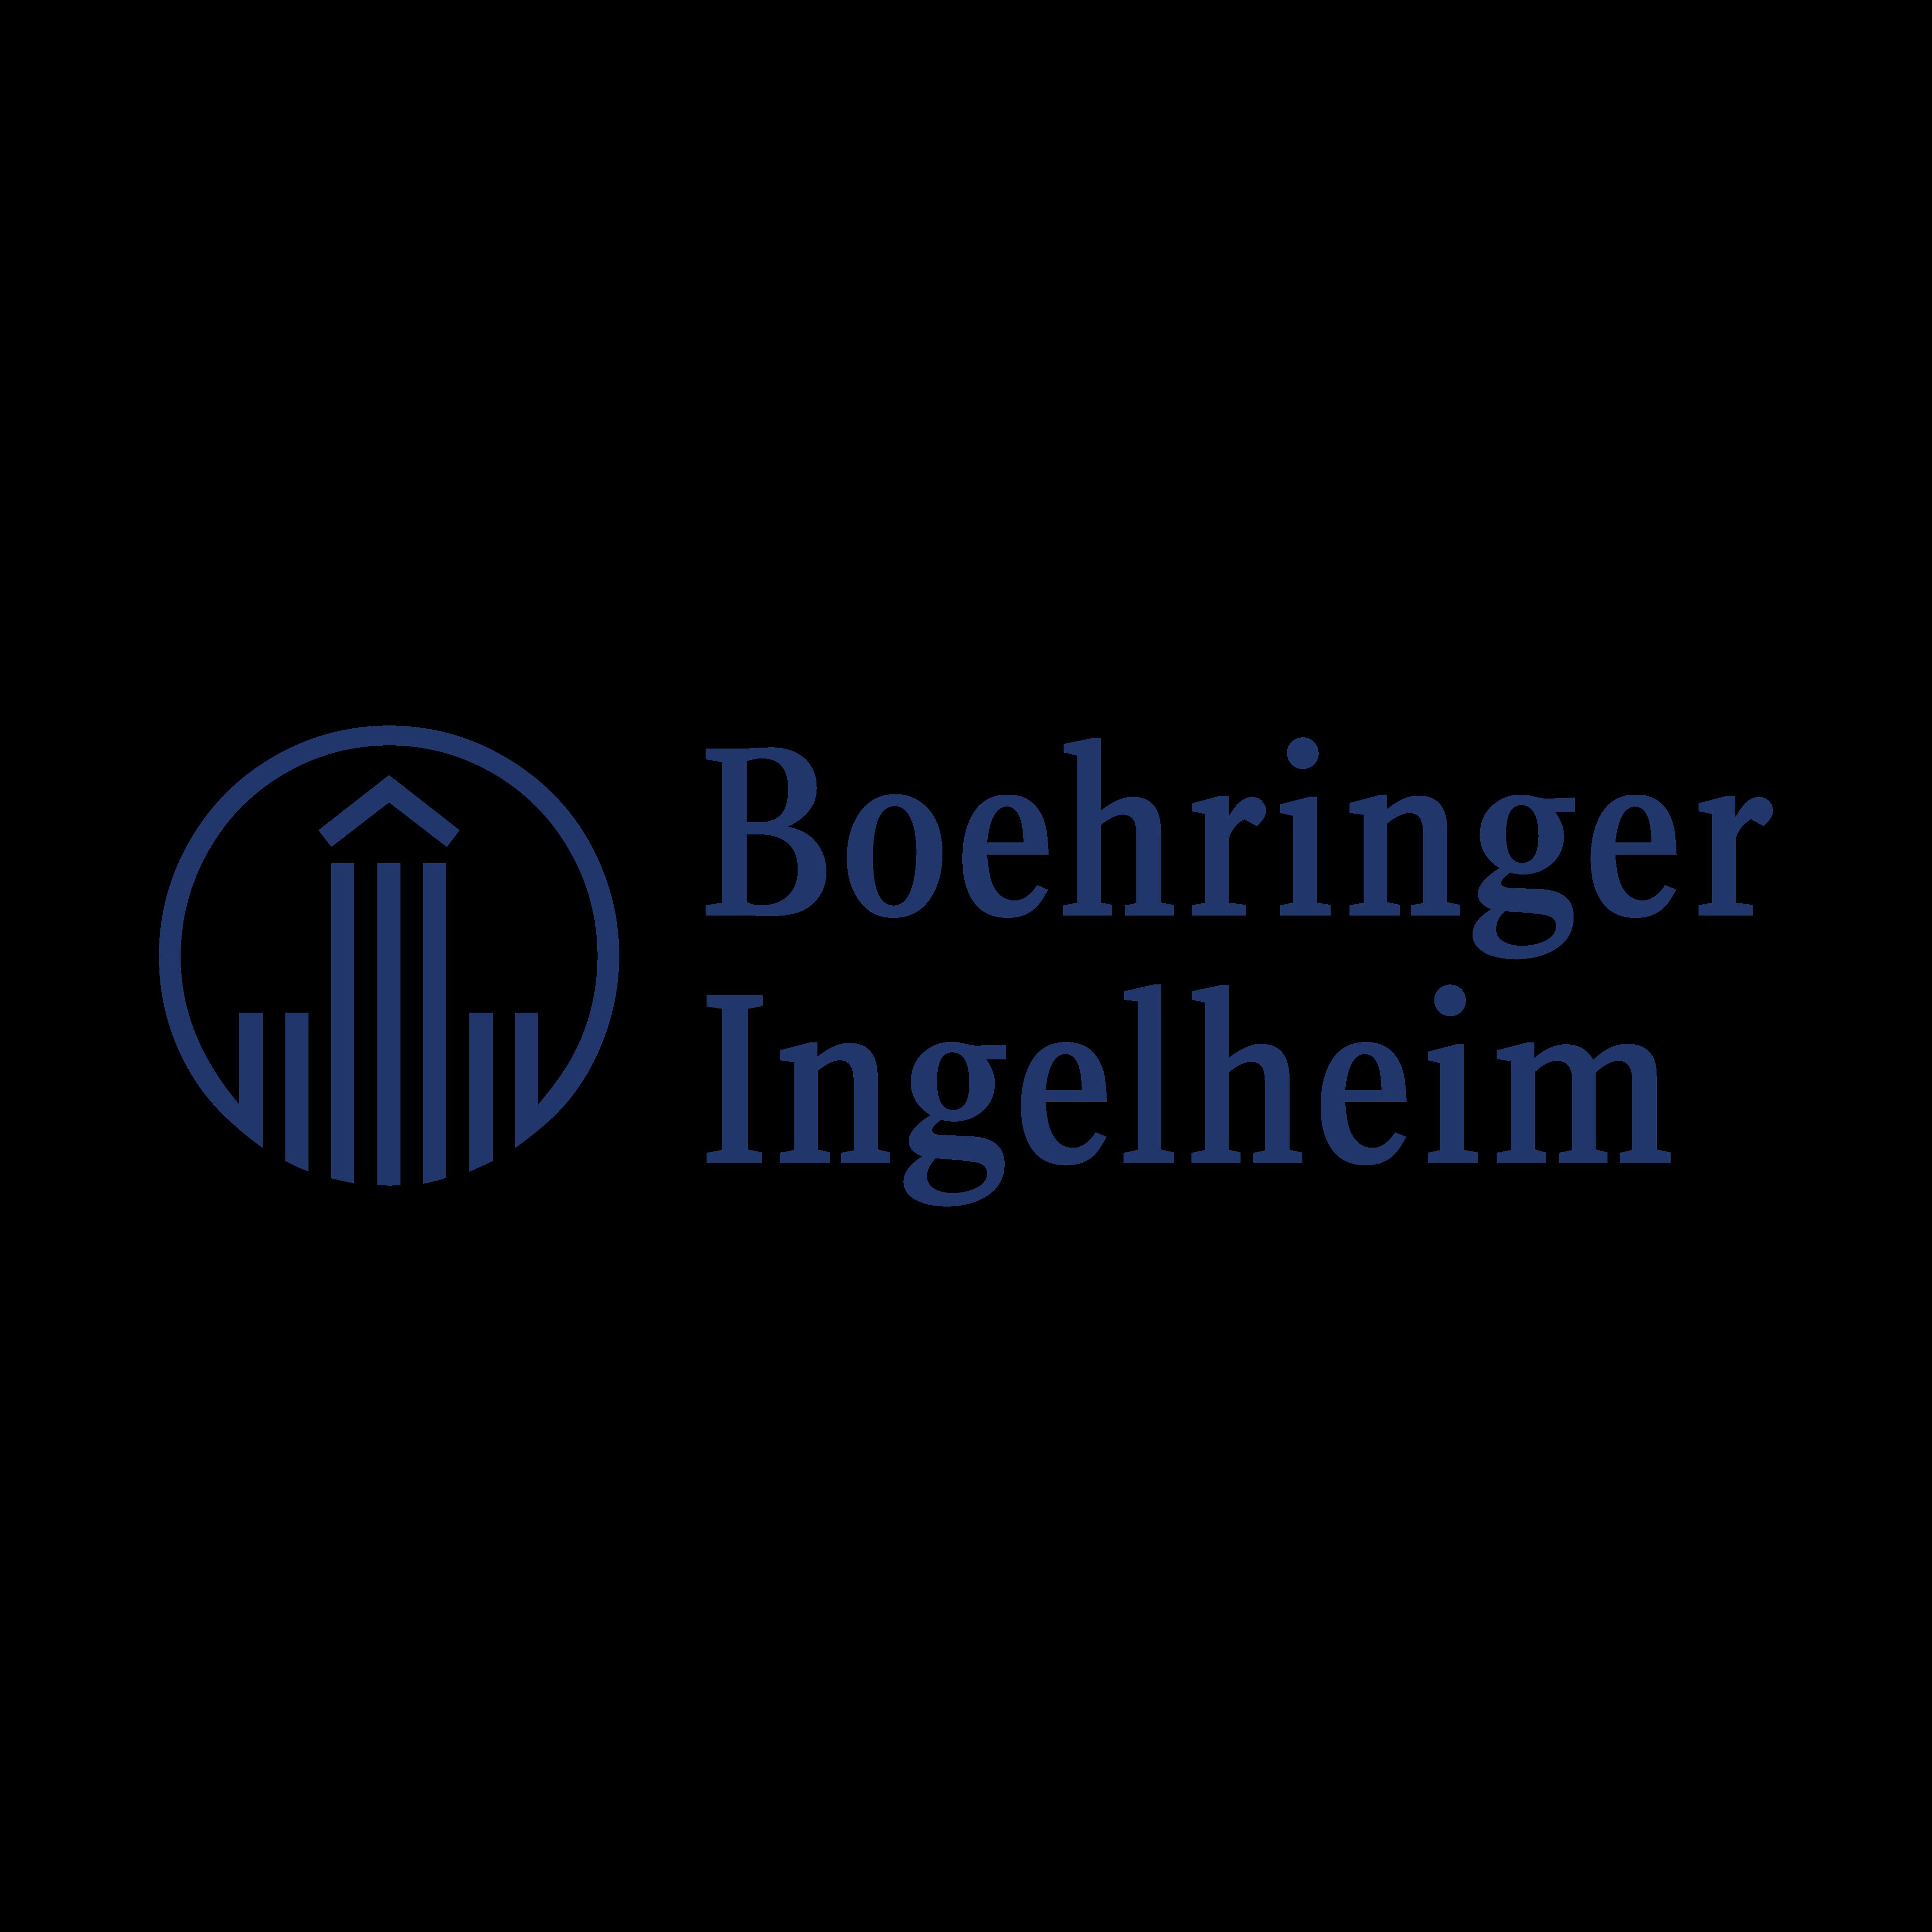 boehringer ingelheim logo 0 - Boehringer Ingelheim Logo